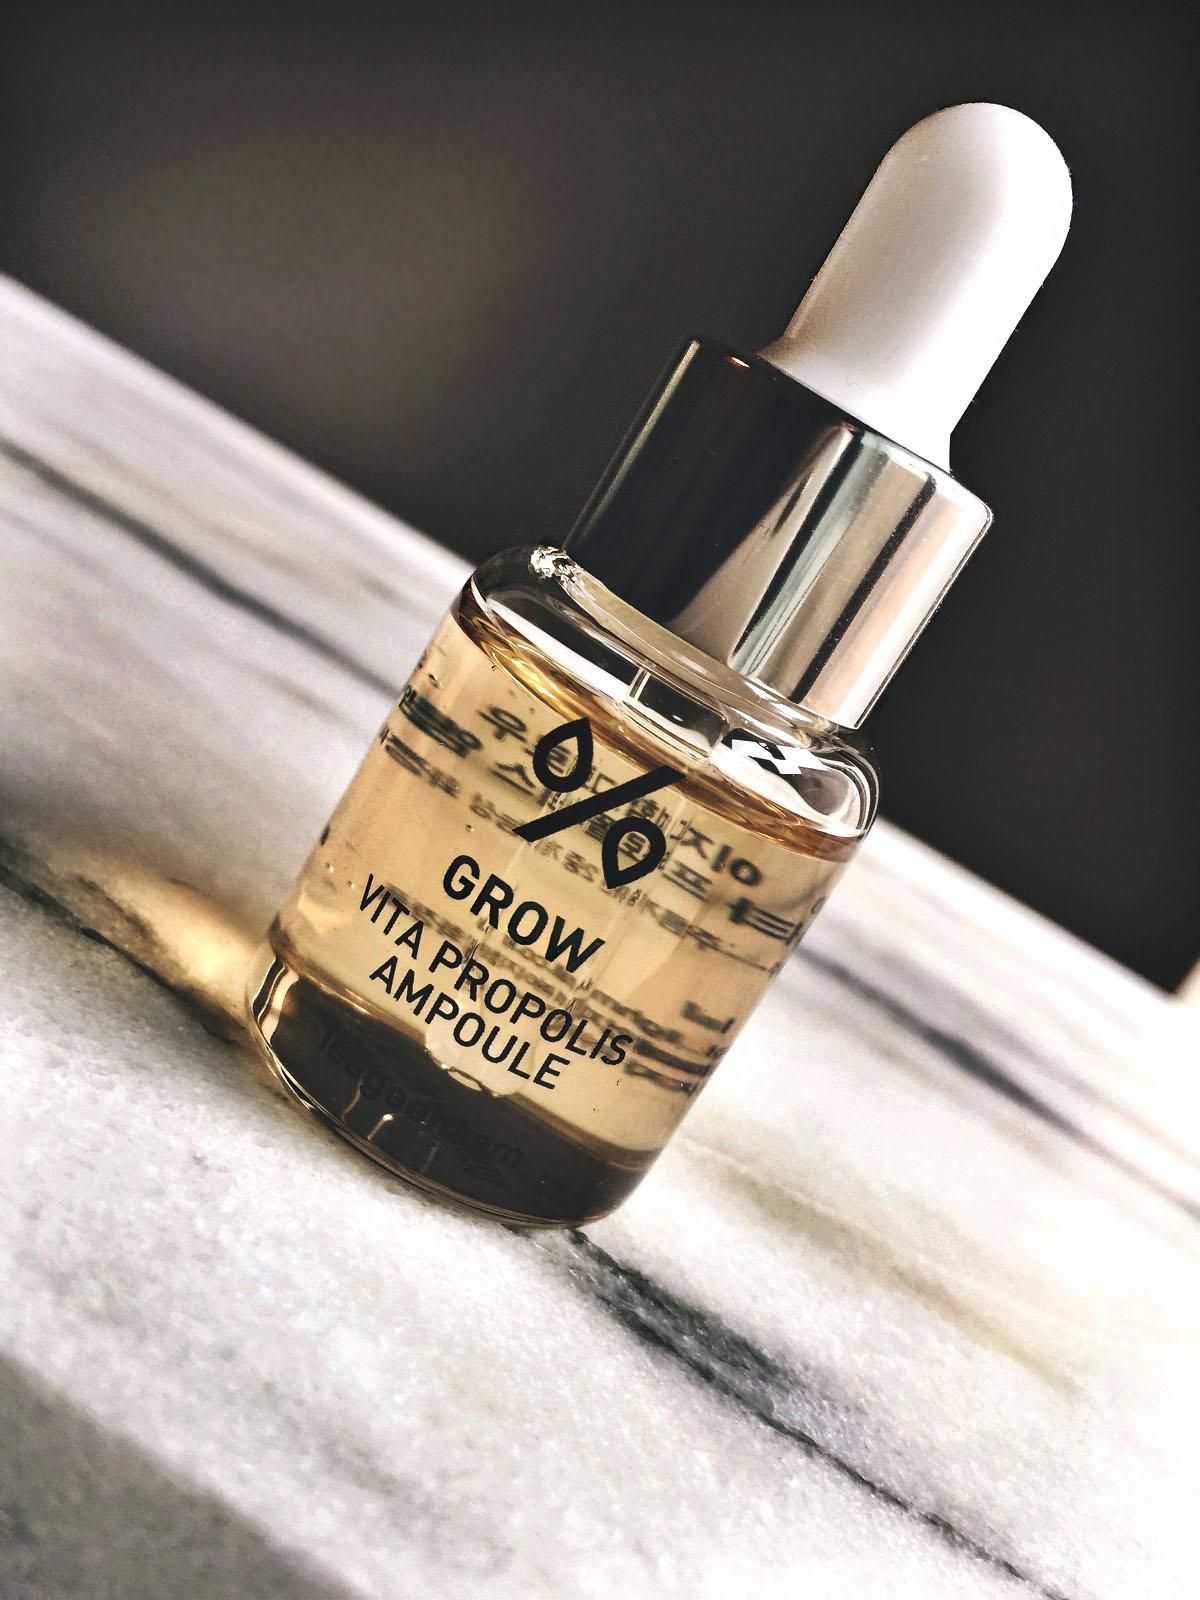 Review: Leegeehaam's Vita Propolis Ampoule — Clean Beauty Ritual